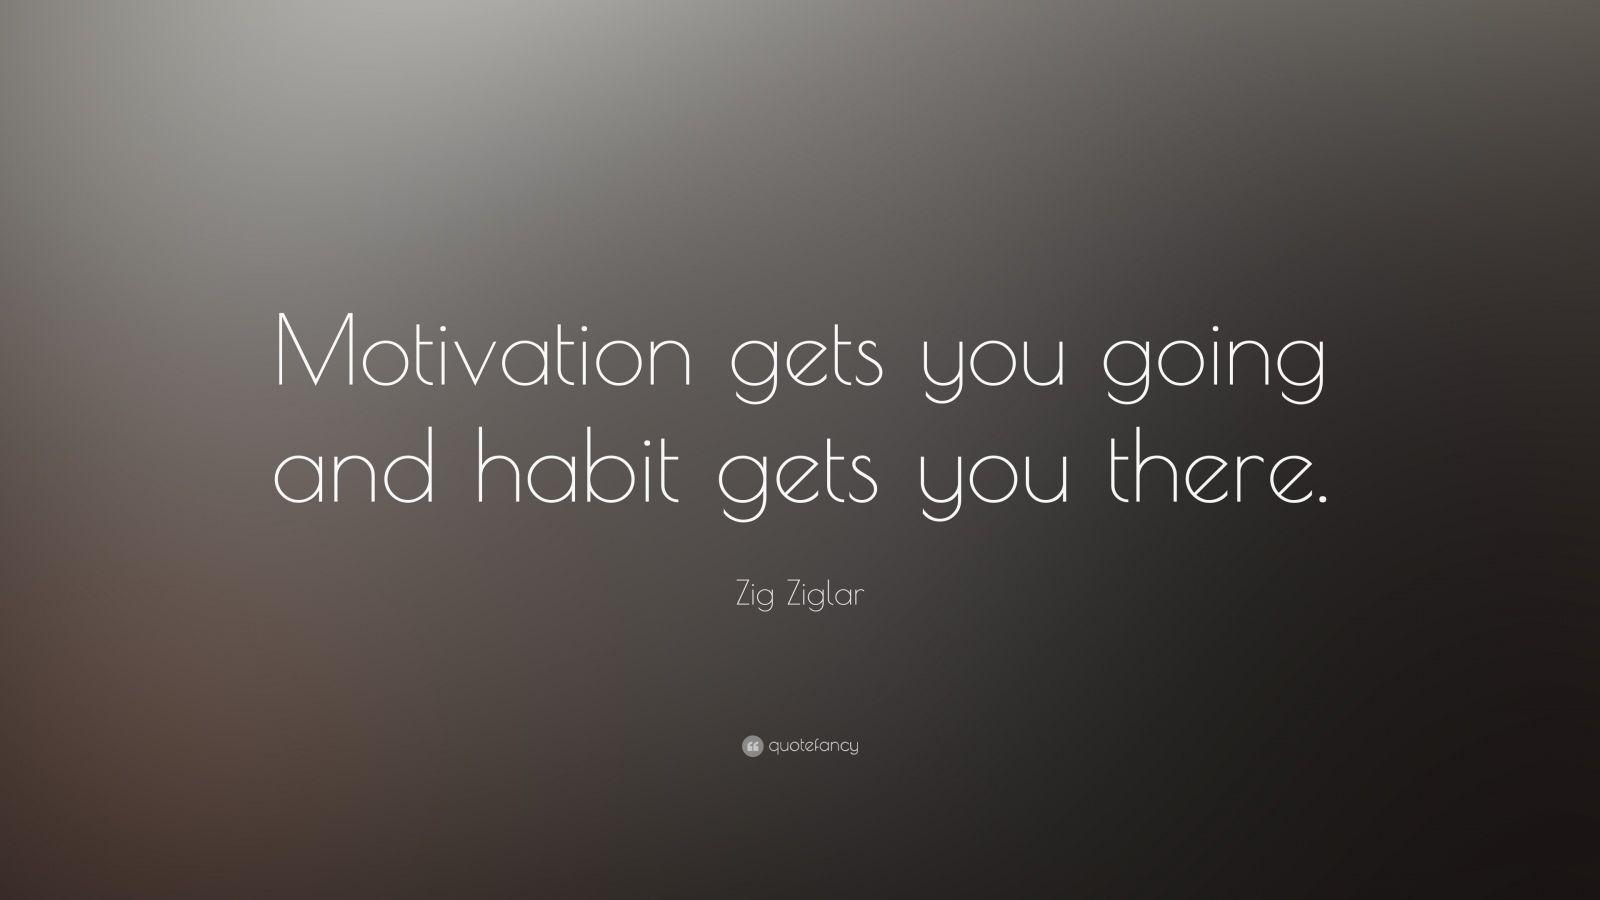 Motivating Quote Wallpaper Zig Ziglar Quote Motivation Gets You Going And Habit